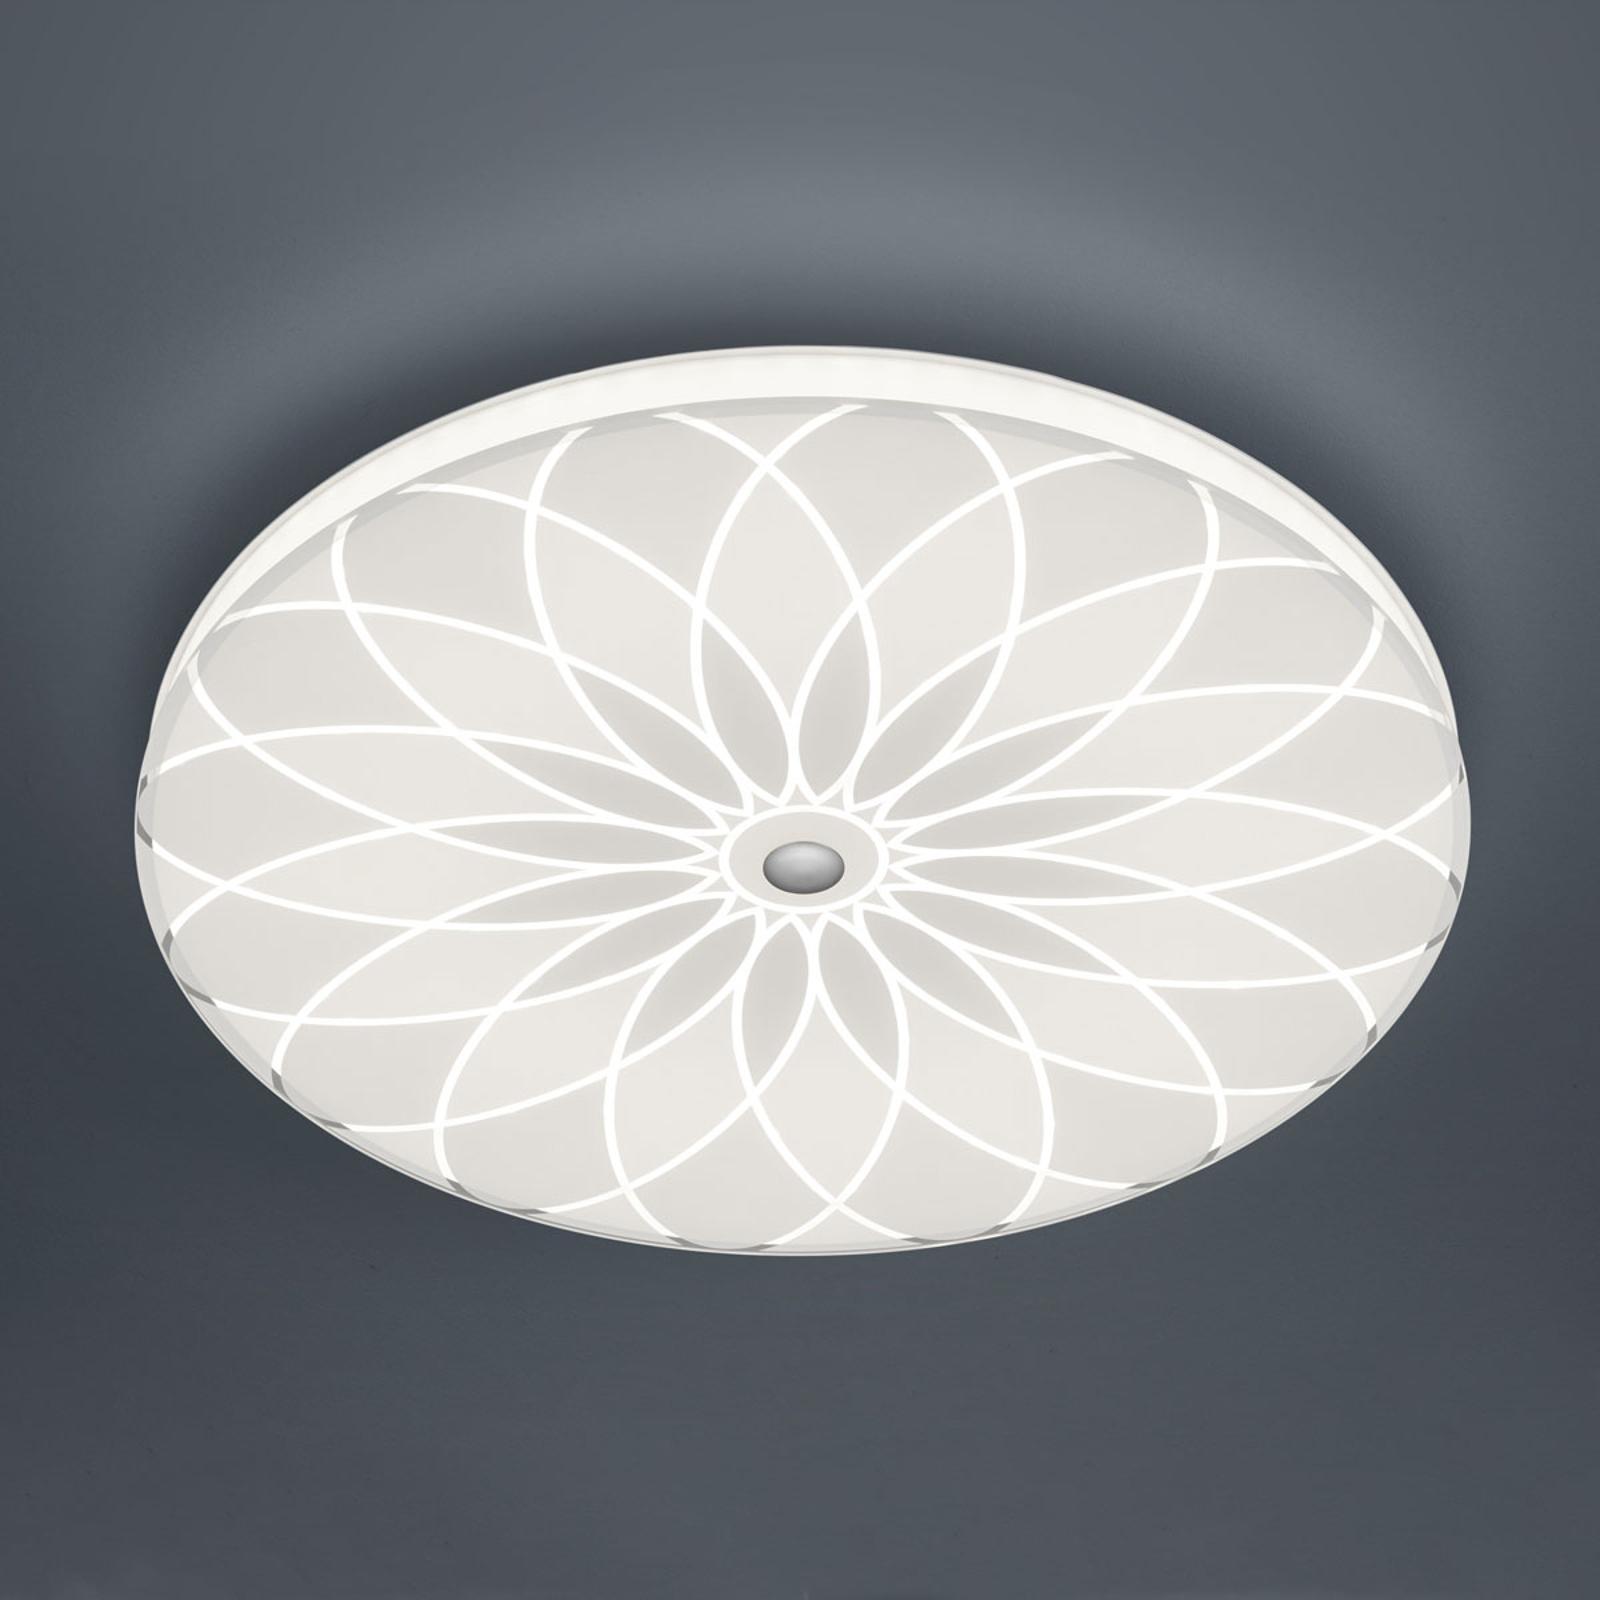 BANKAMP Mandala lampa sufitowa LED kwiat, Ø 52 cm